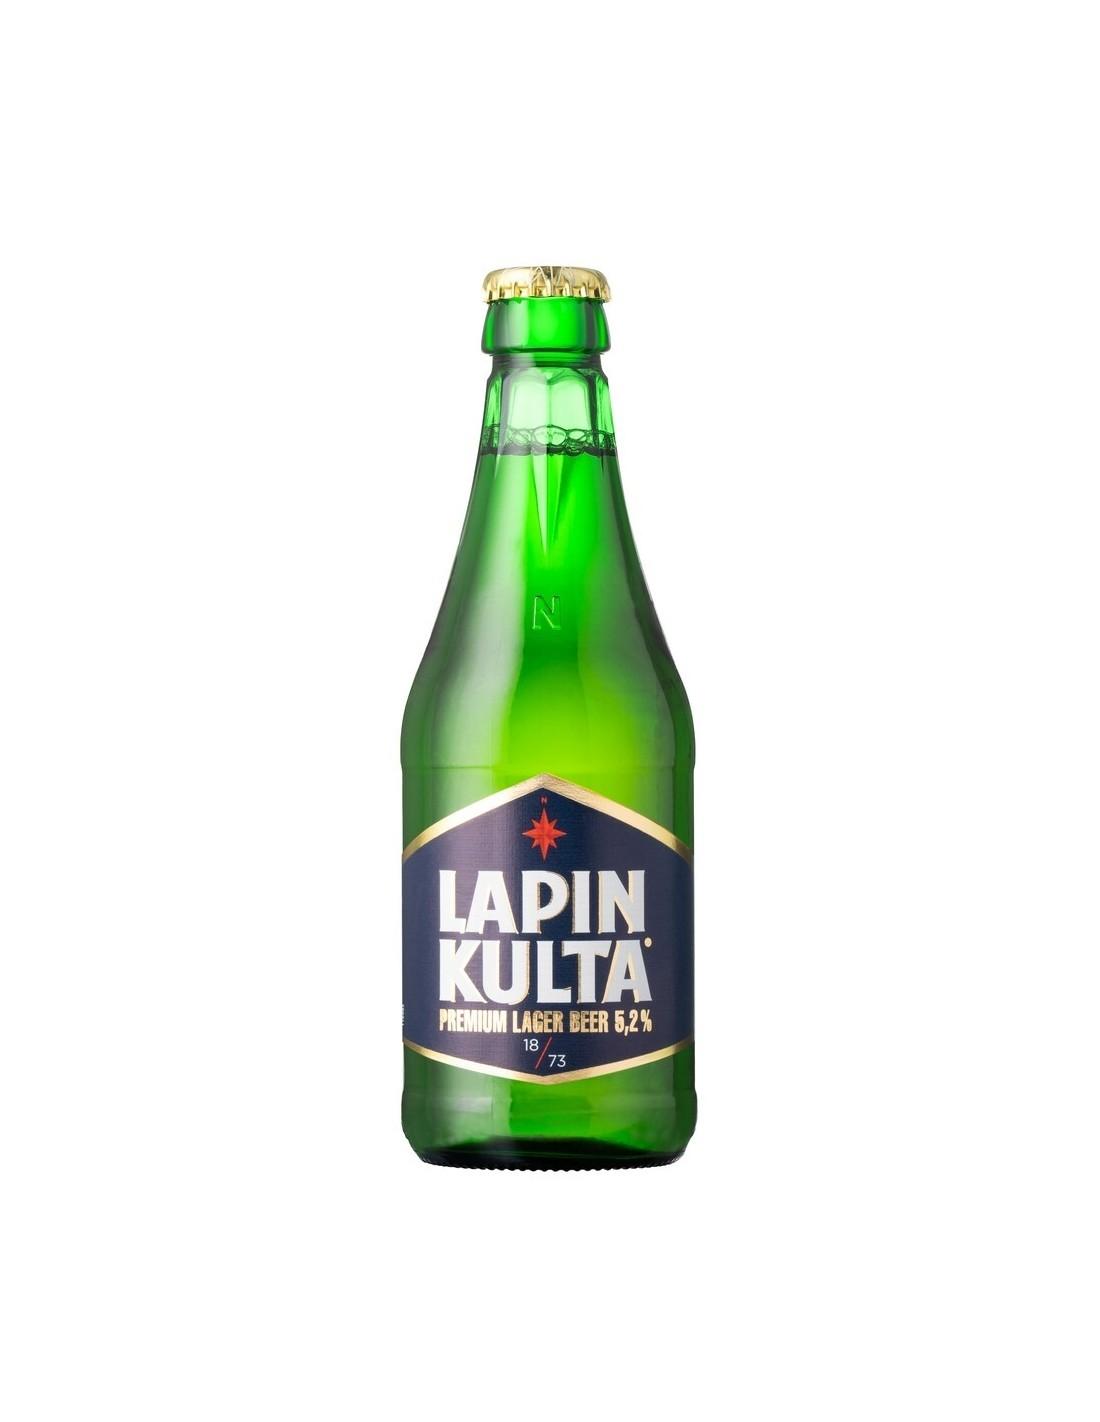 Bere blonda lager, Lapin Kulta Premium, 5.2% alc., 0.33L, Finlanda